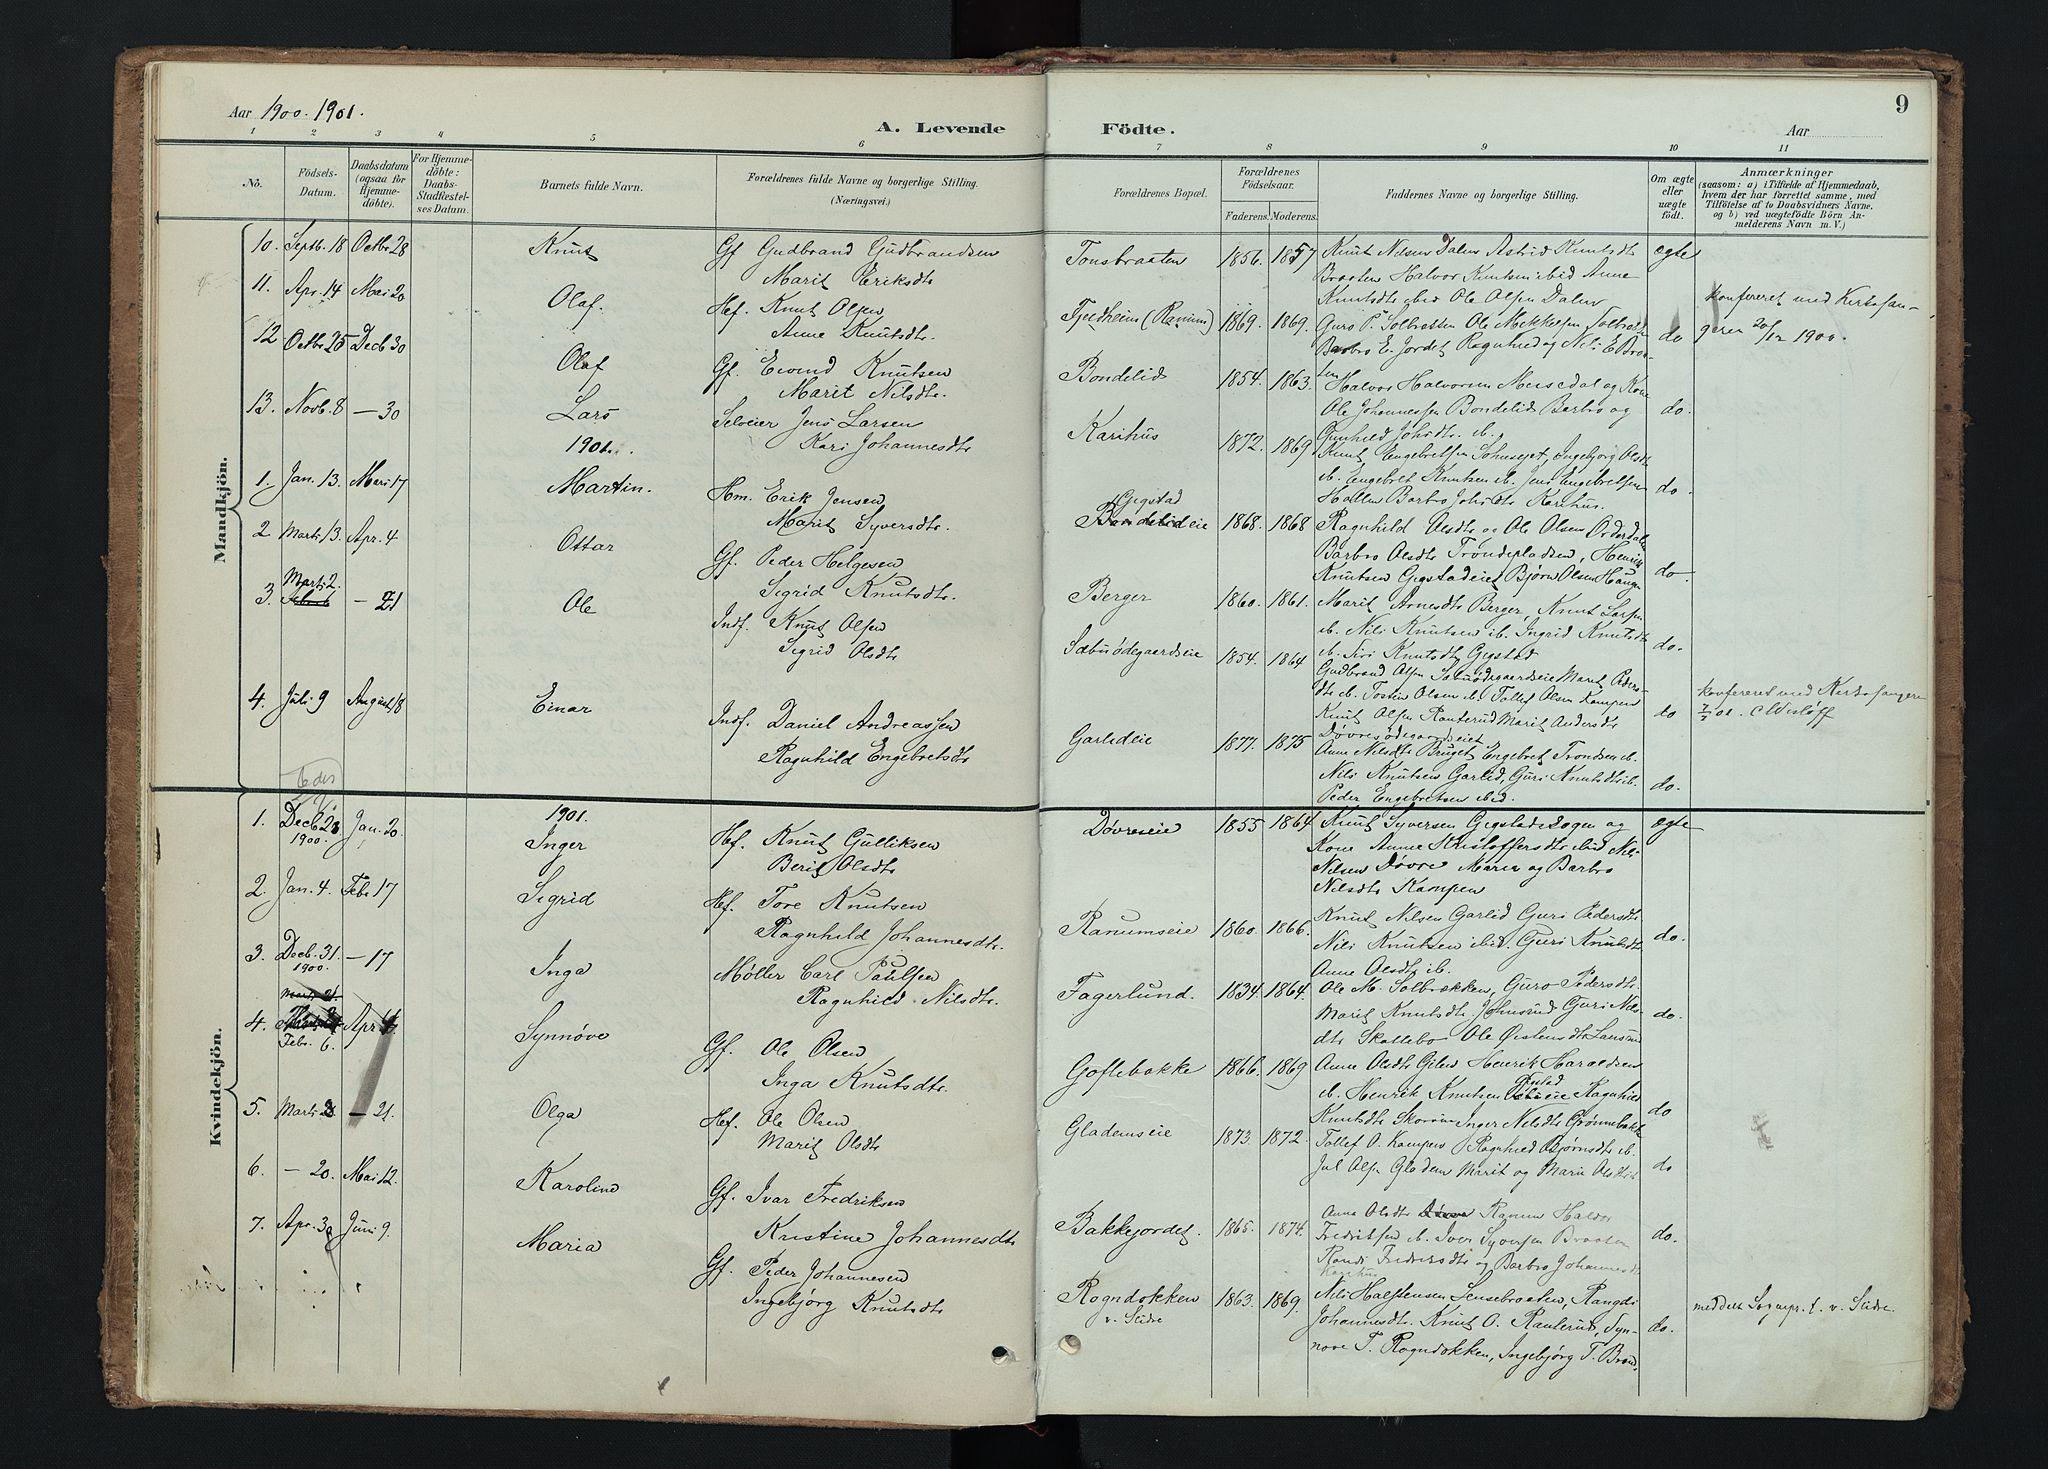 SAH, Nord-Aurdal prestekontor, Ministerialbok nr. 15, 1896-1914, s. 9